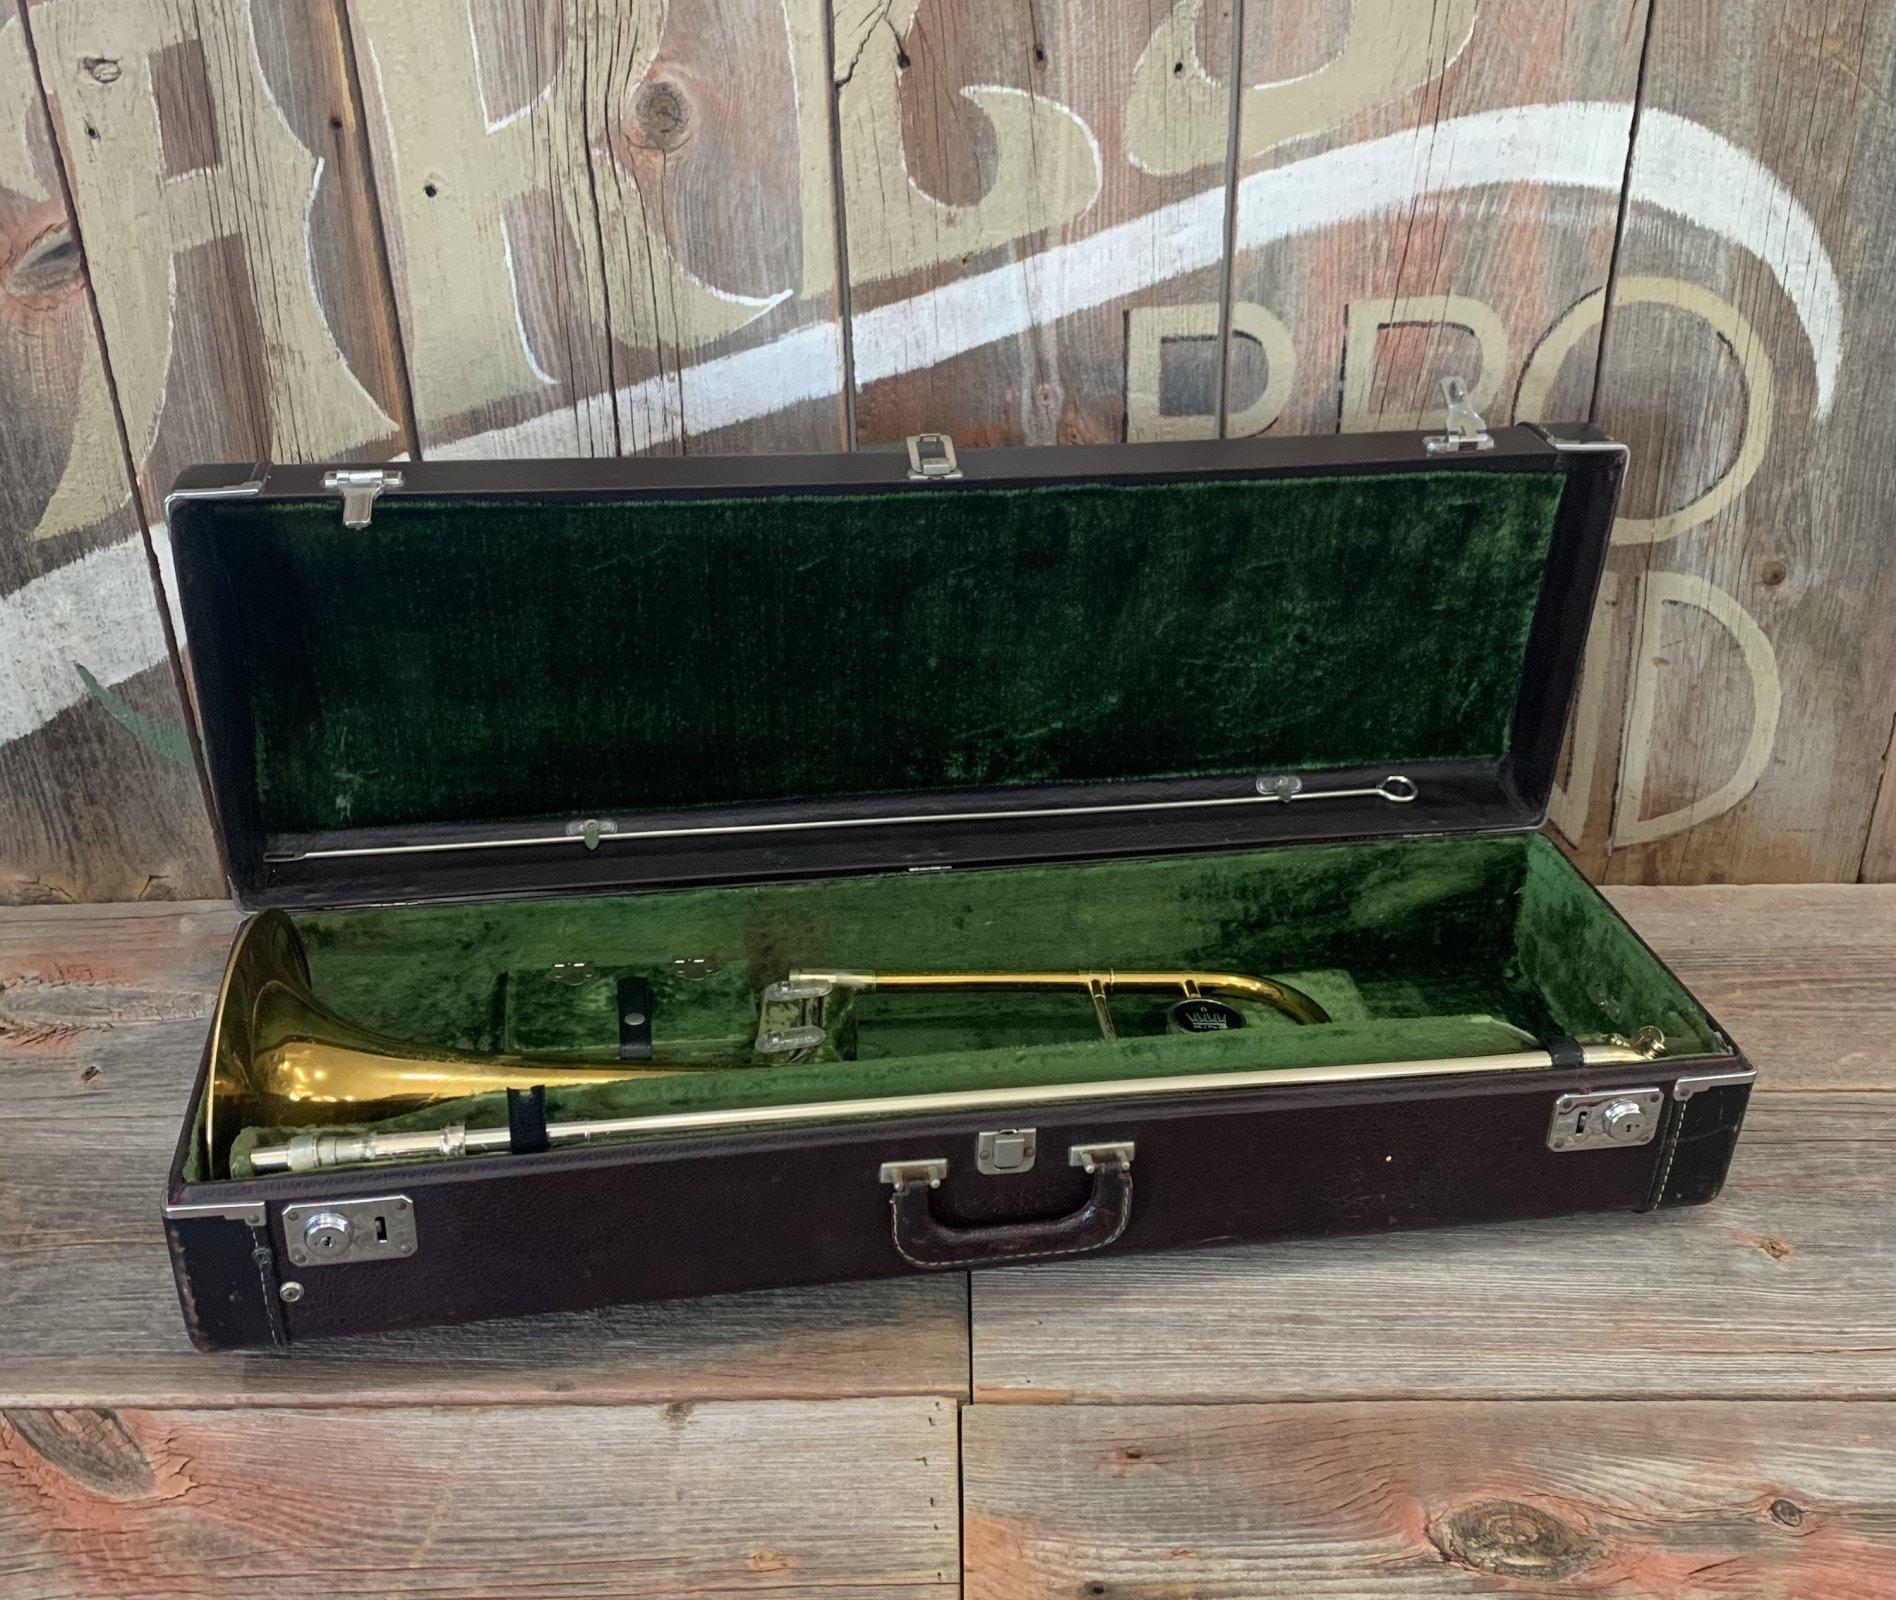 King 4B Sonorous Trombone Vintage 1974 - Used